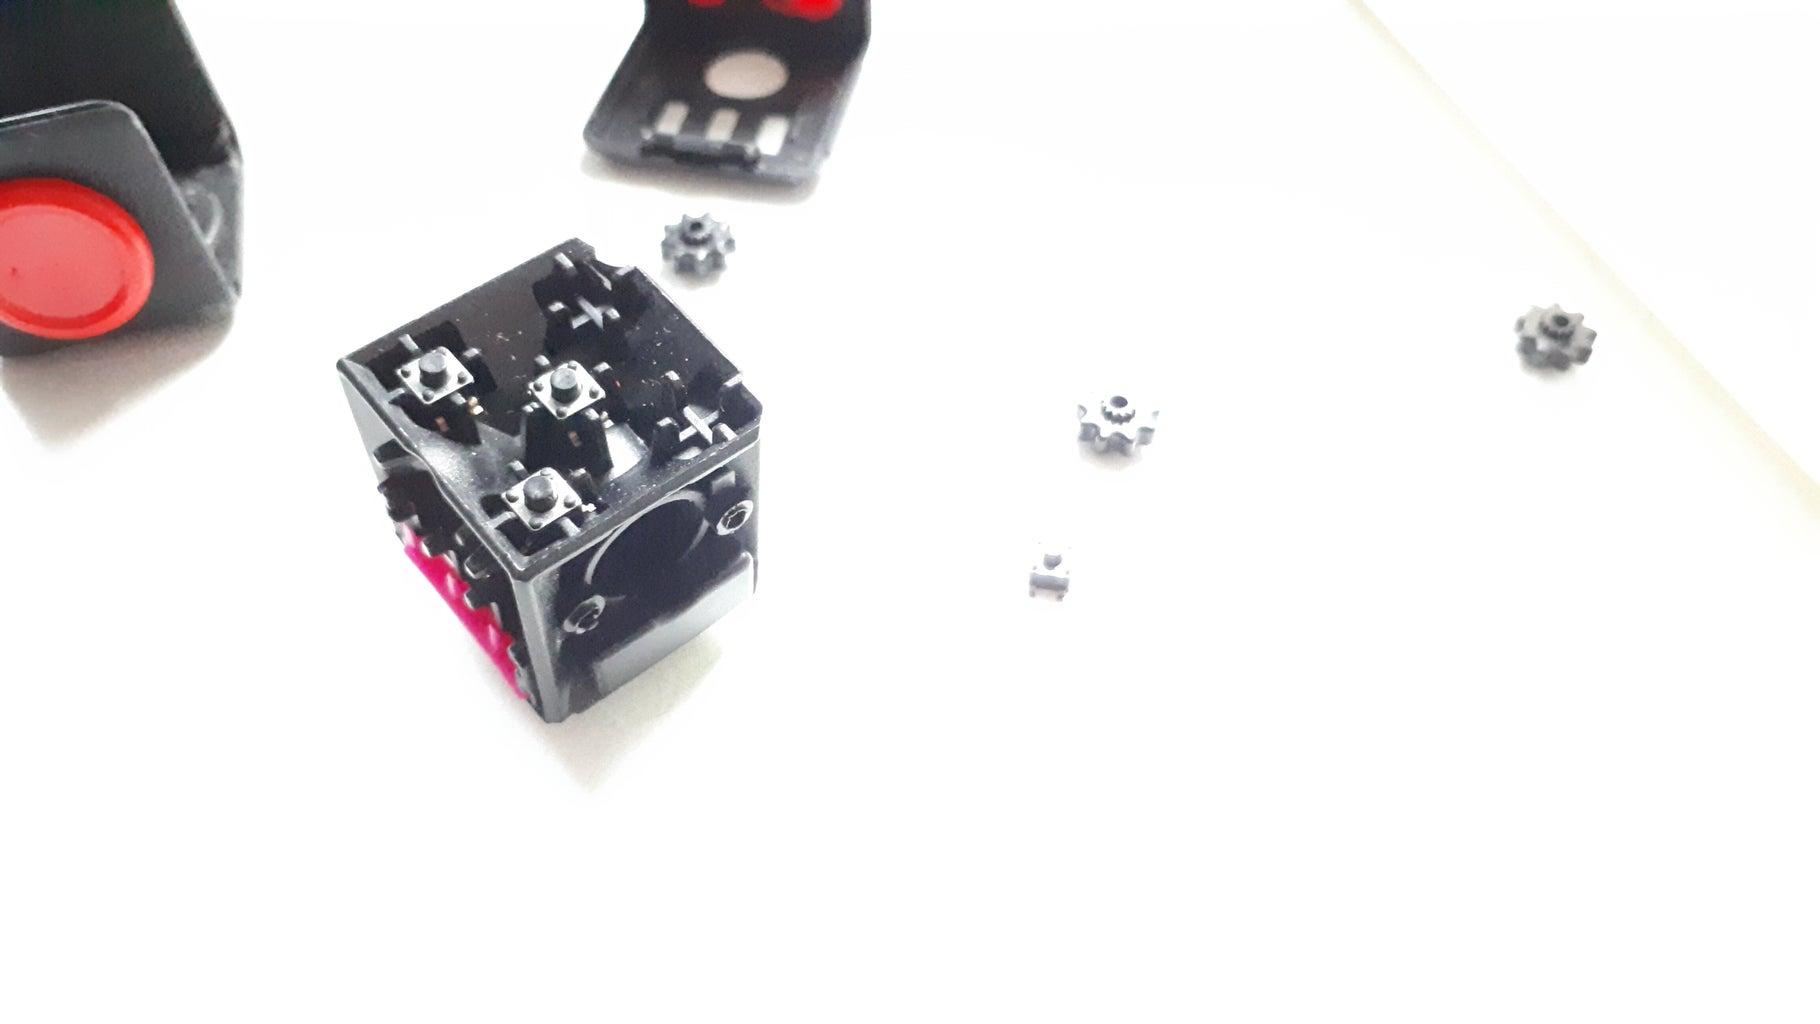 Opening the Fidget Cube